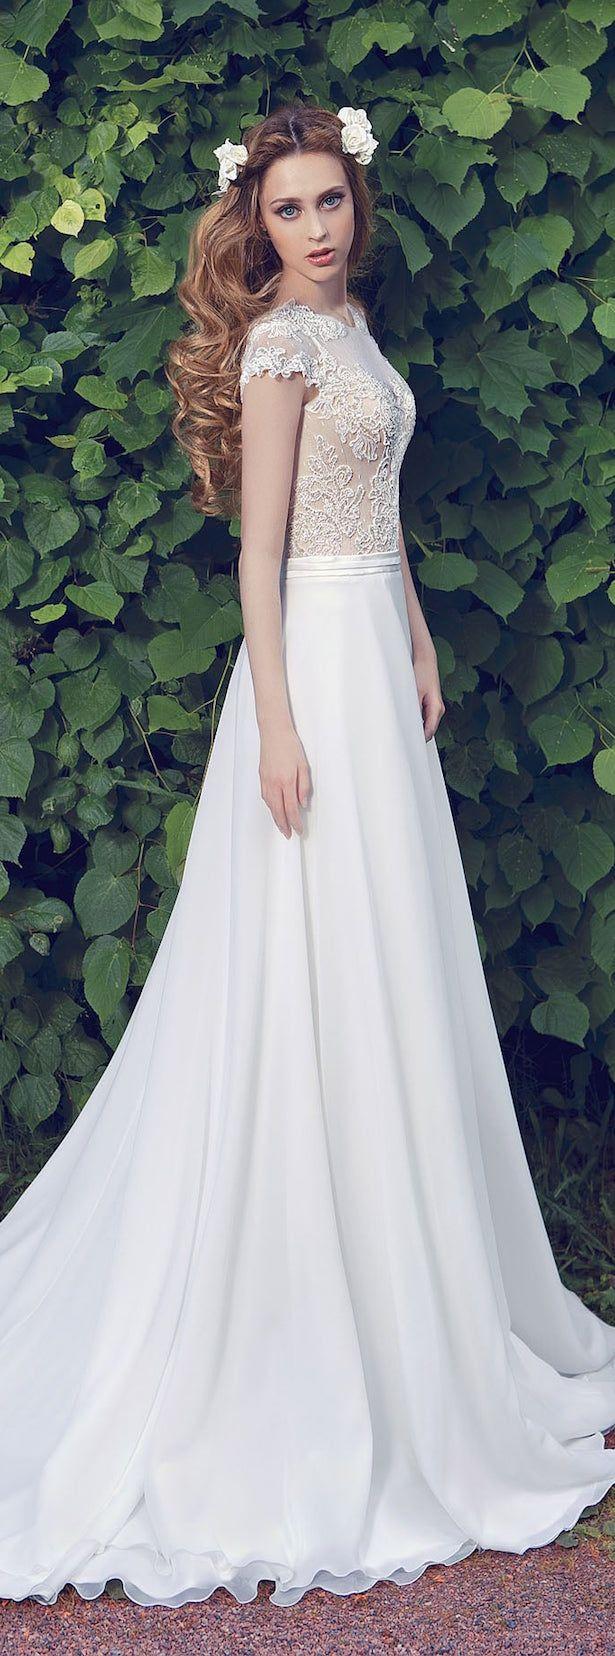 Milva 2016 Wedding Dresses - Fairy Gardens Collection | Pinterest ...